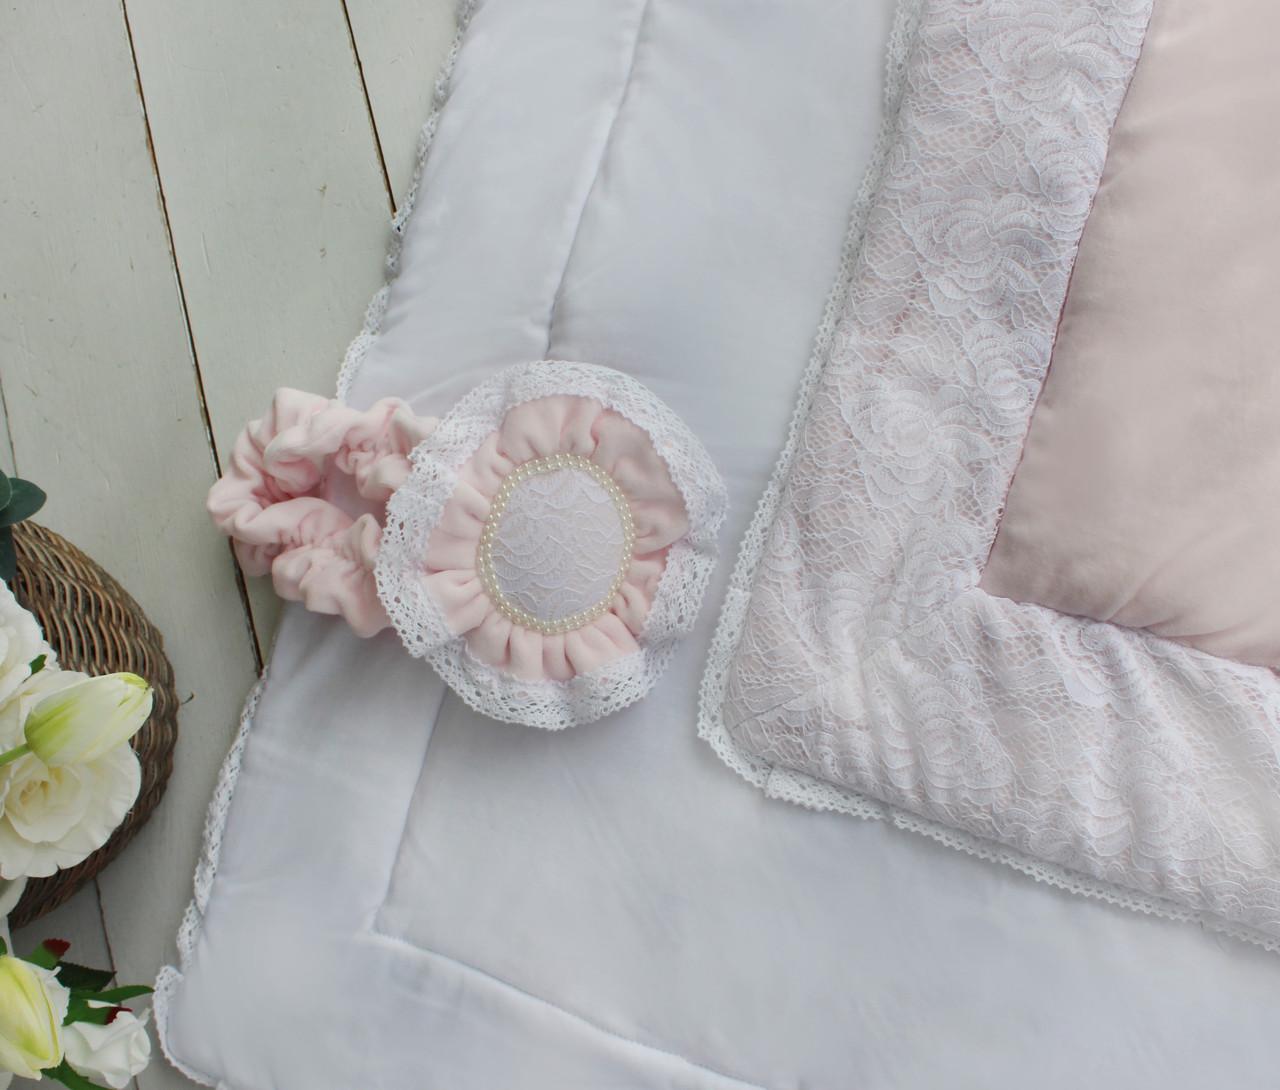 Конверт - одеяло Розовый цветок венса - осень, фото 1